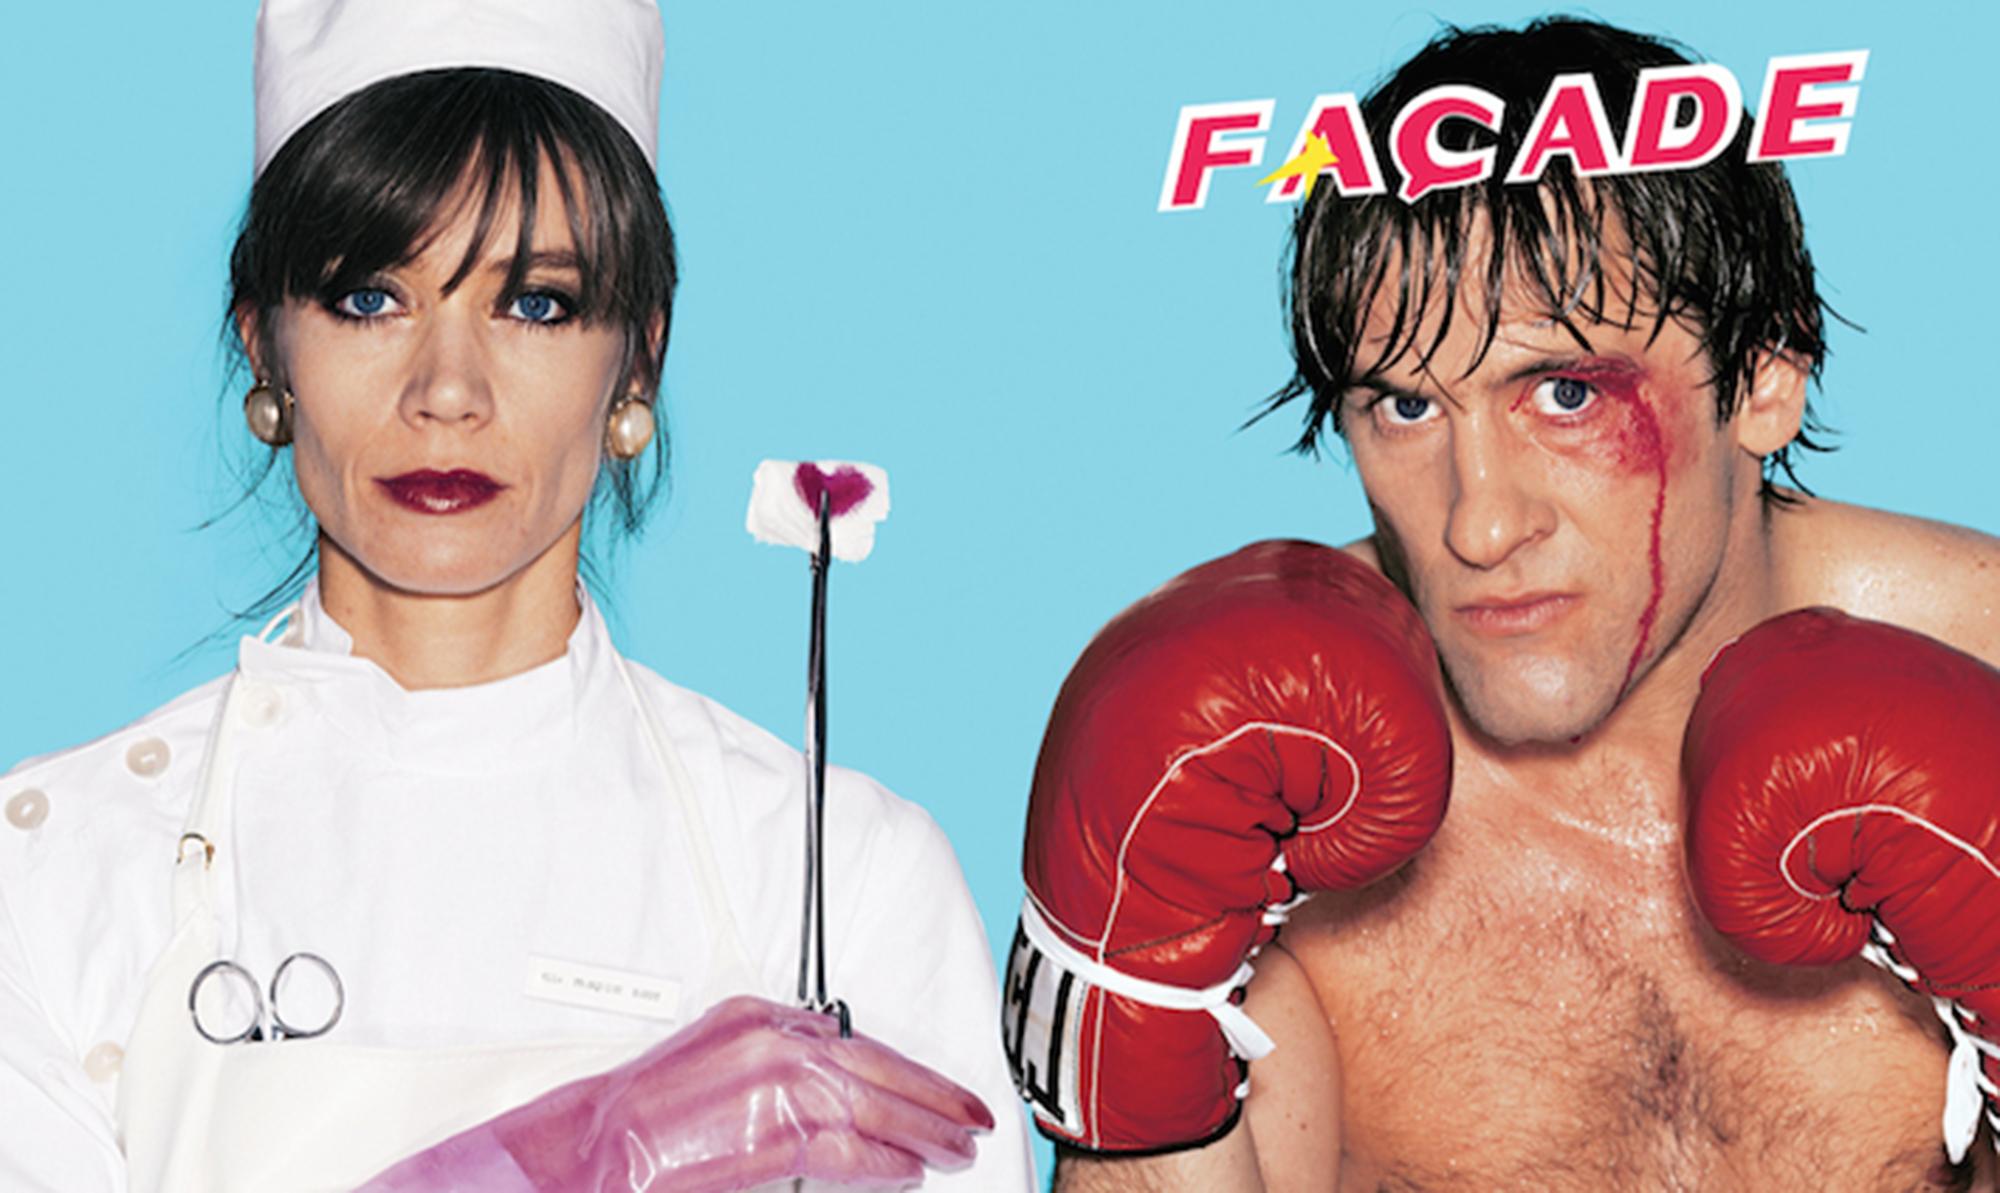 Façade Magazine #11 starring Gérard Depardieu & Françoise Hardy (1981) - Image © Façade Magazine   www.facadeparis.com